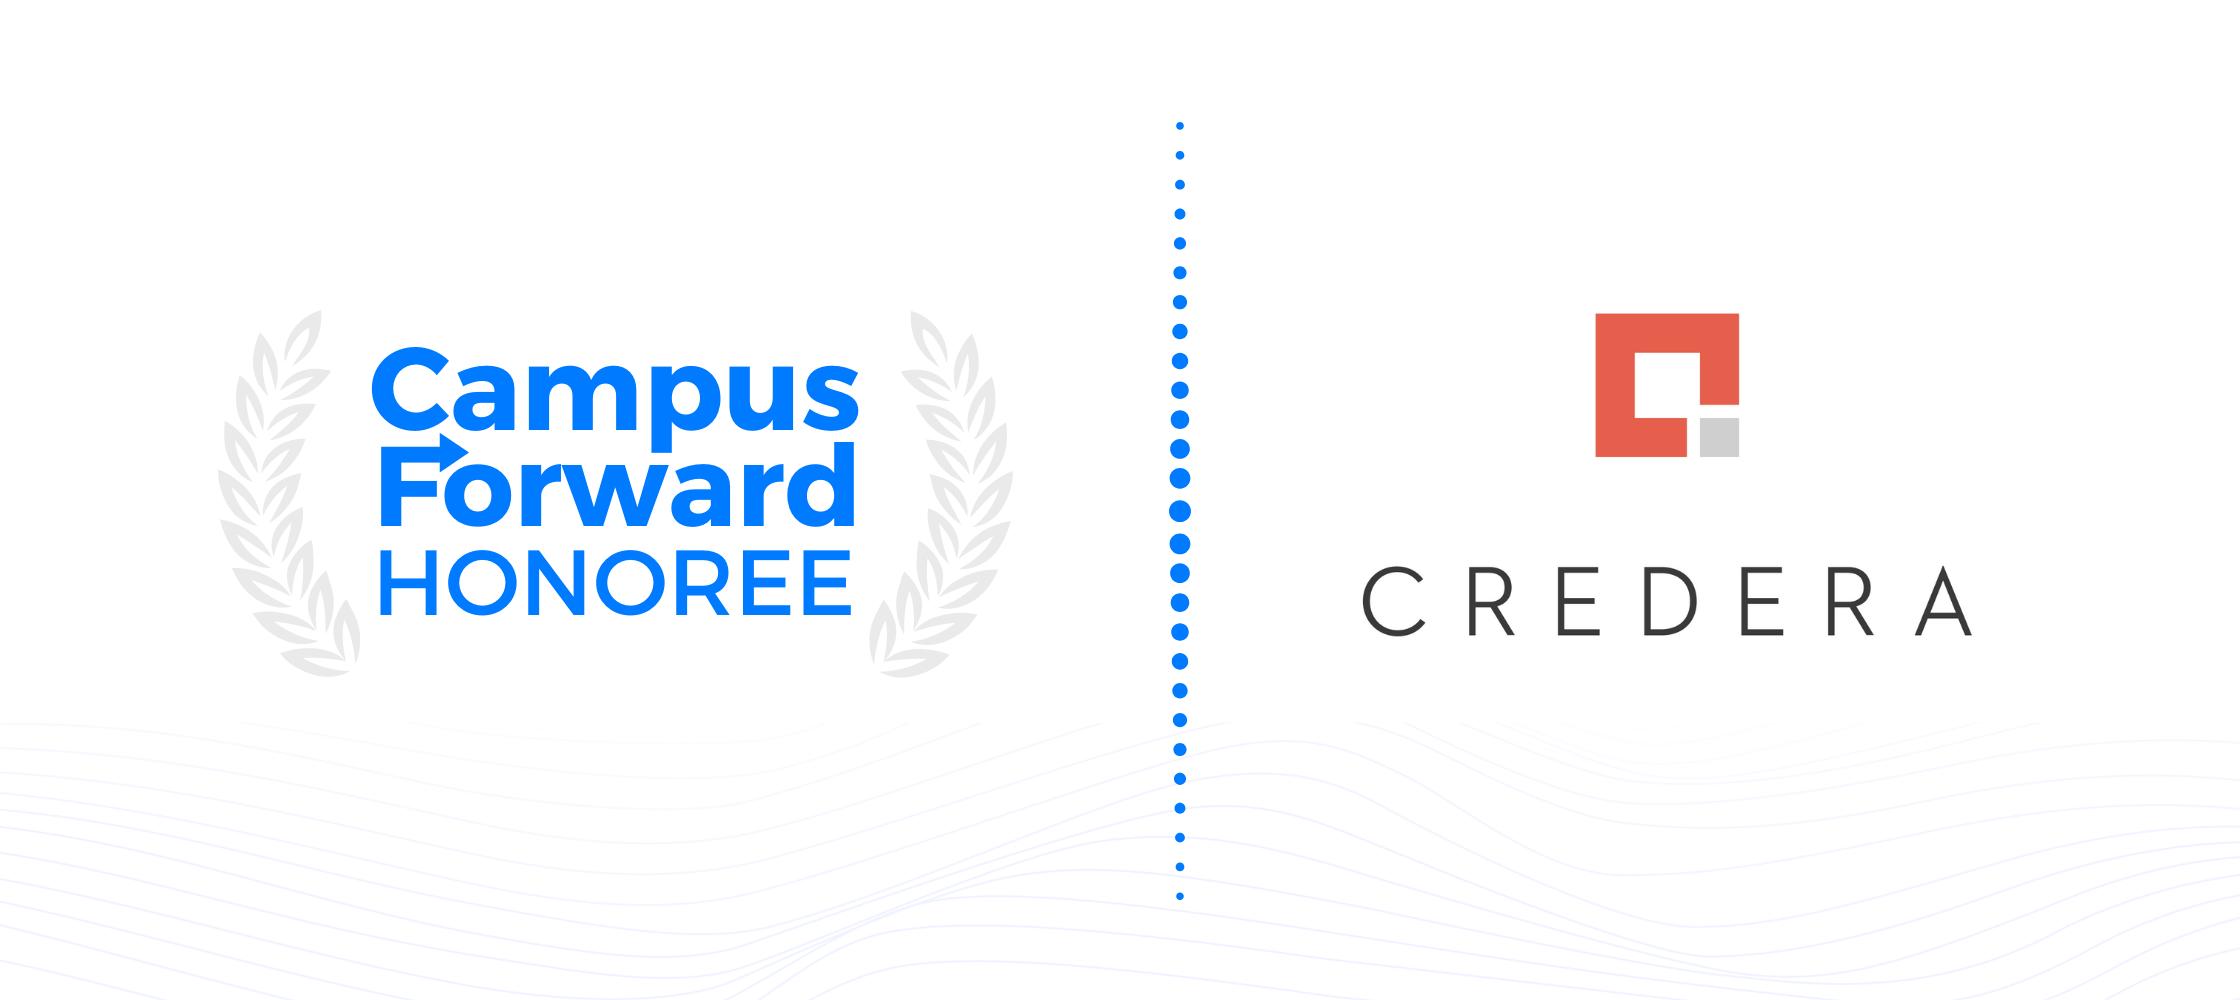 Campus Forward Honoree - Credera